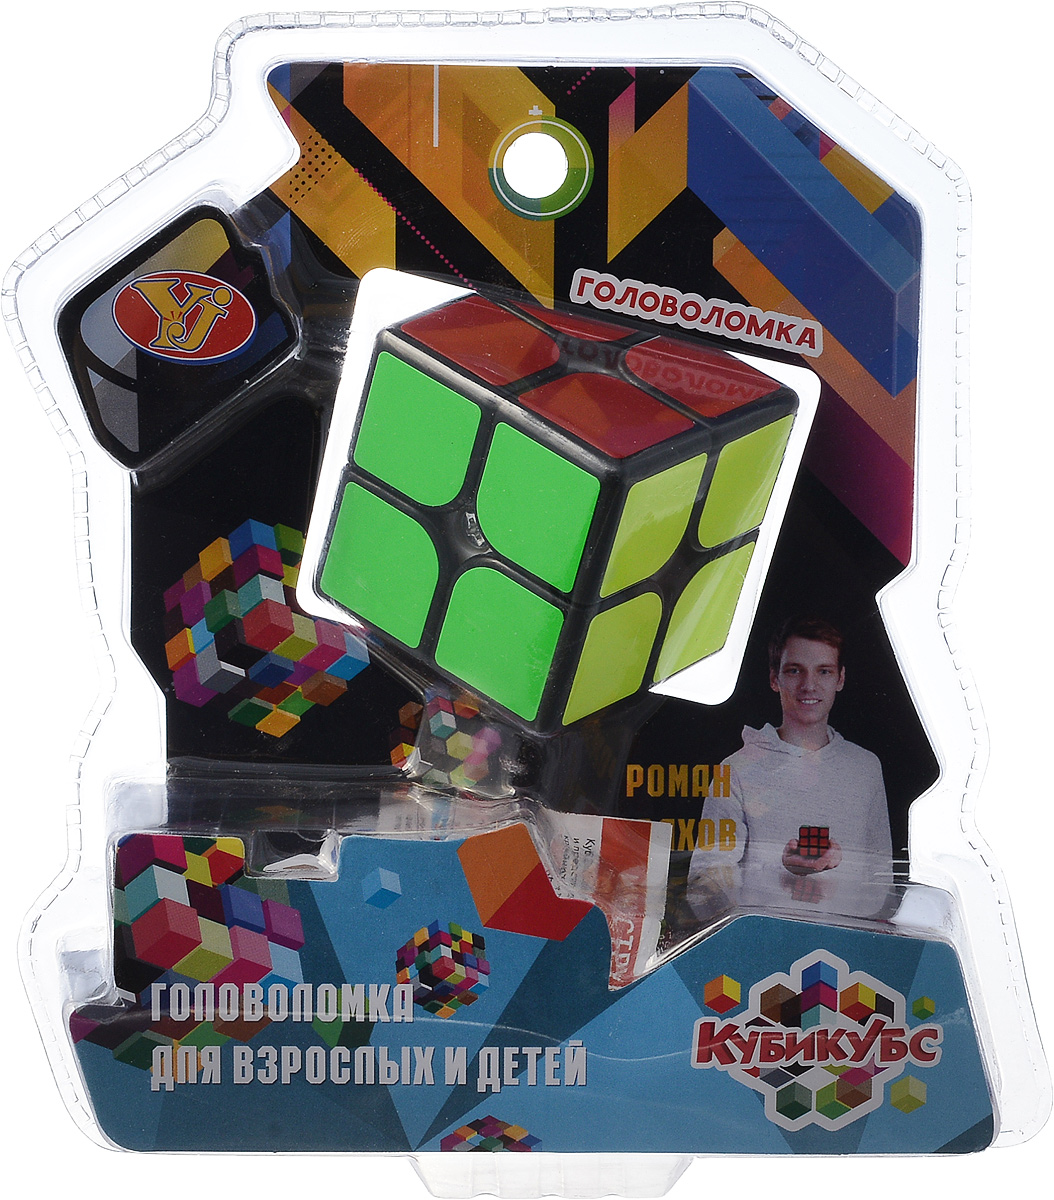 цена Головоломка Junfa Toys Кубикубс, ZY761036 онлайн в 2017 году